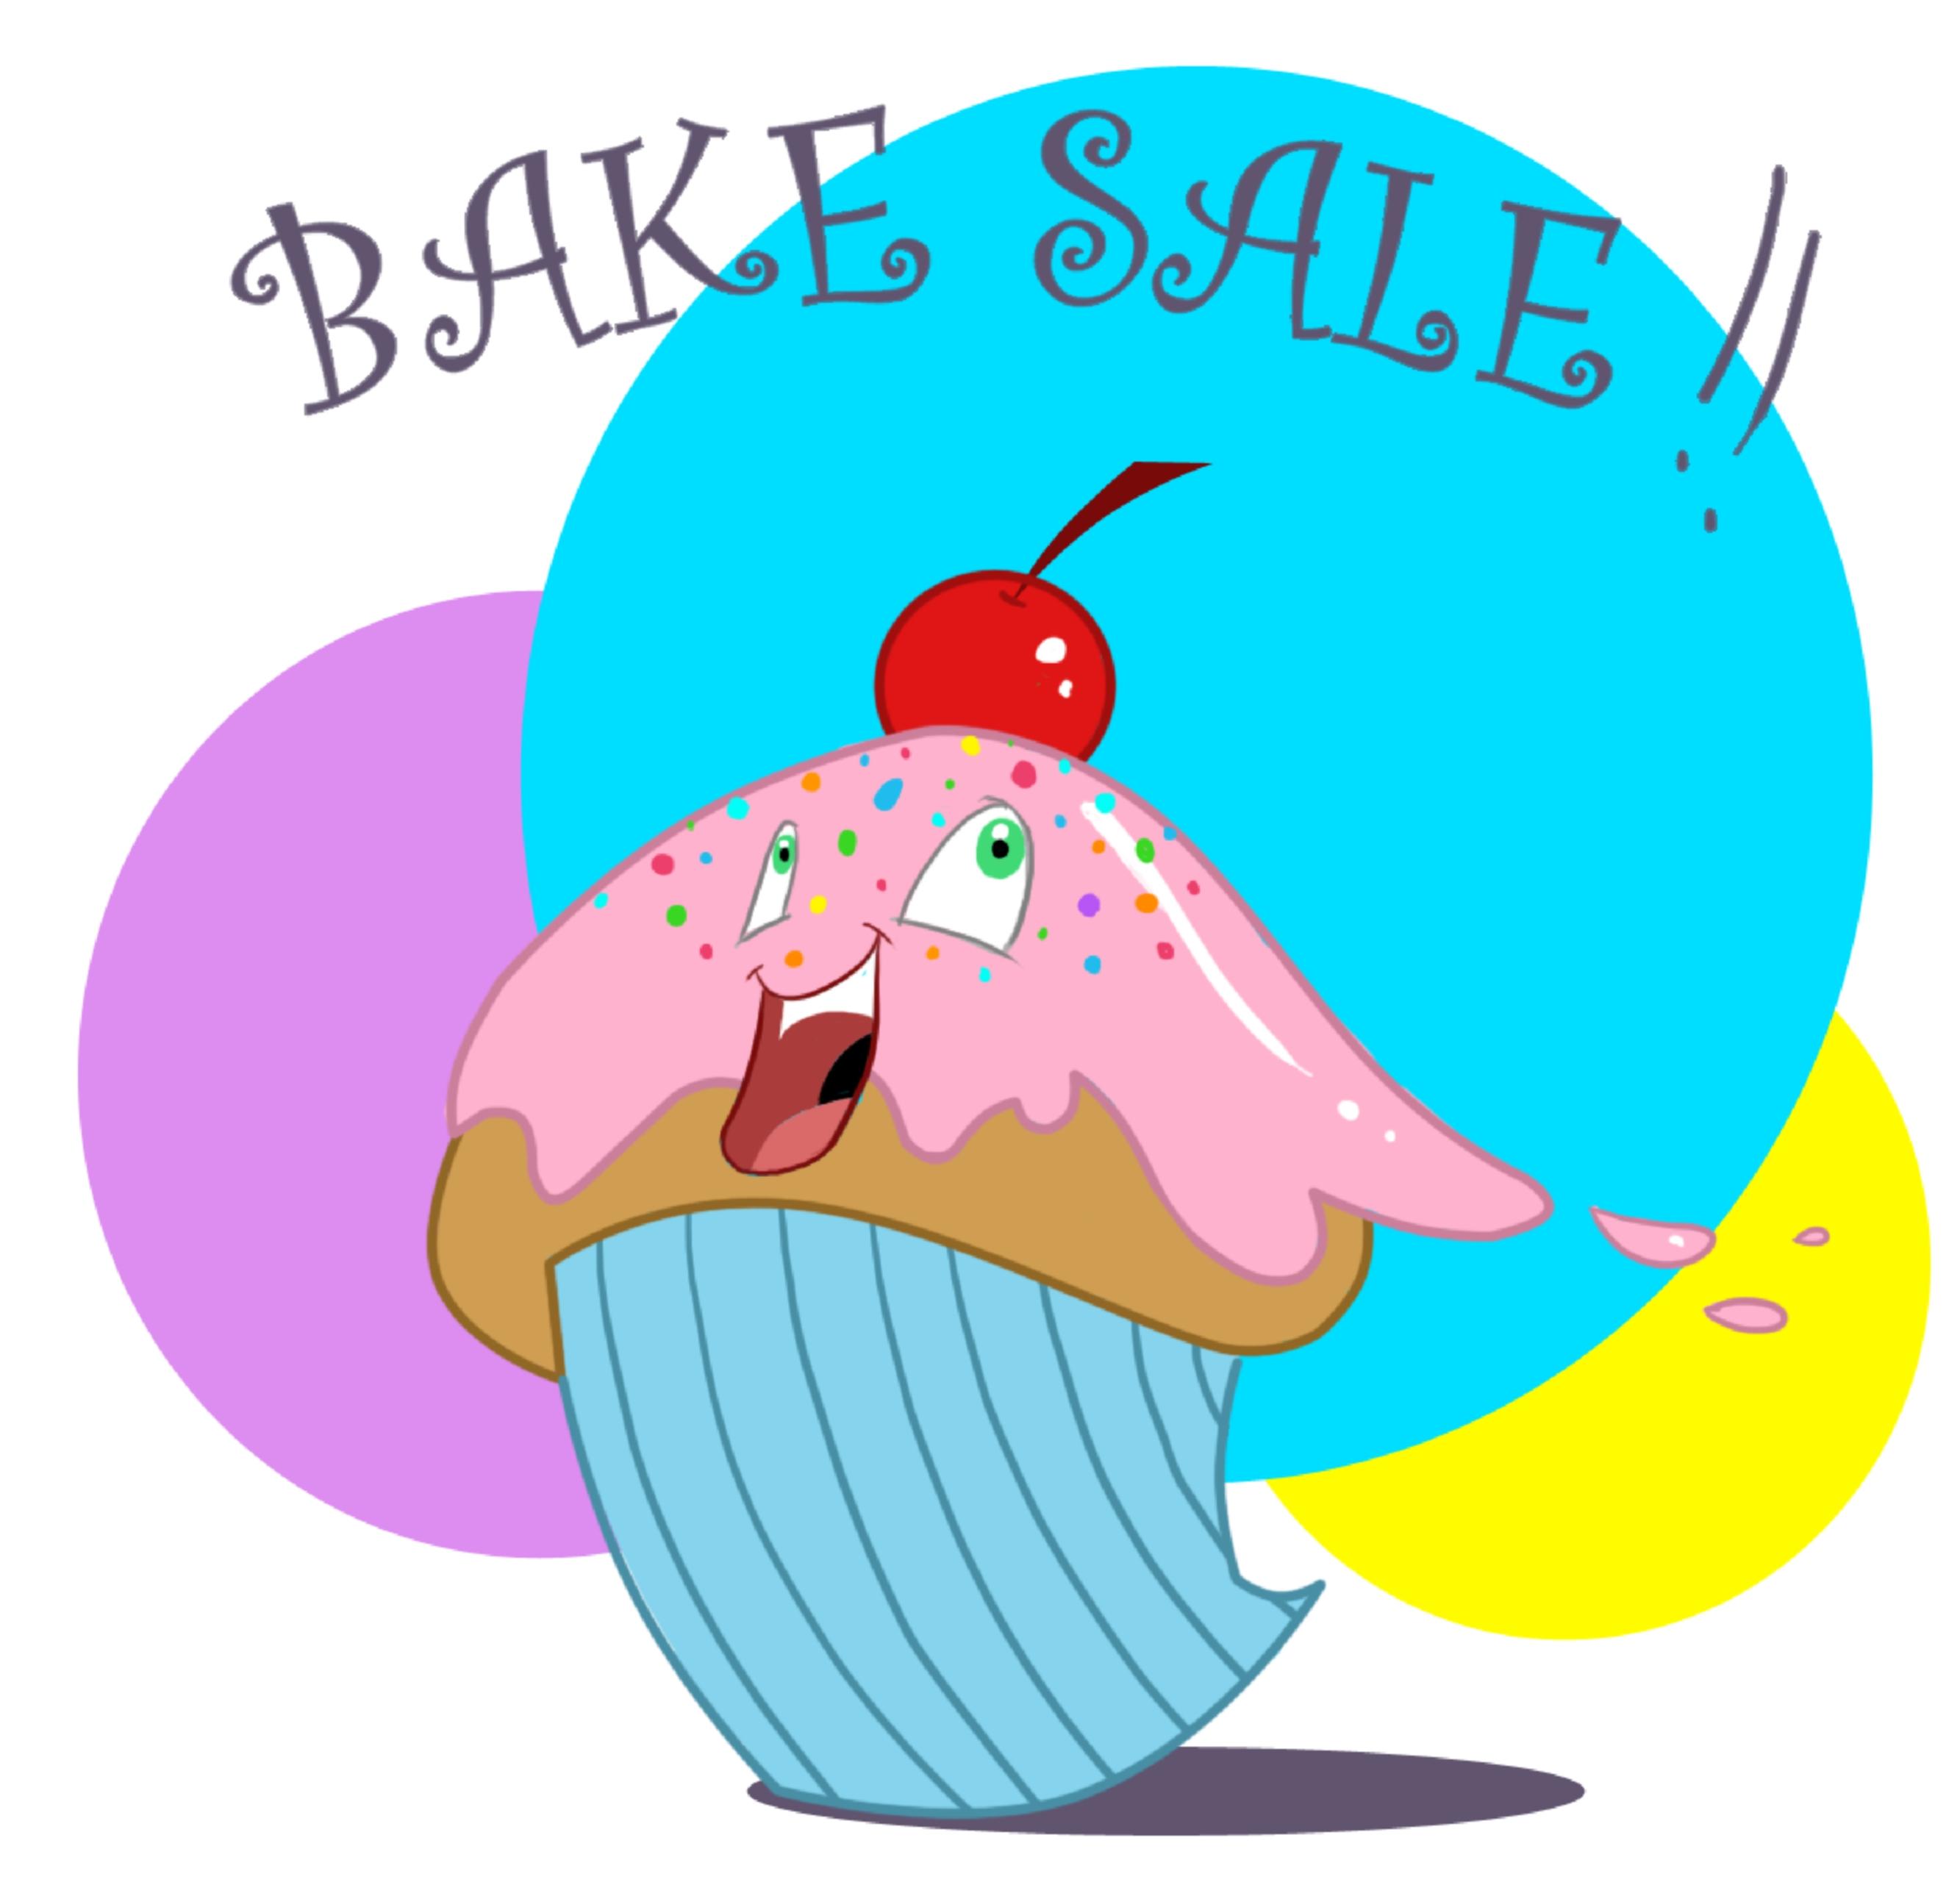 Bake Sale.